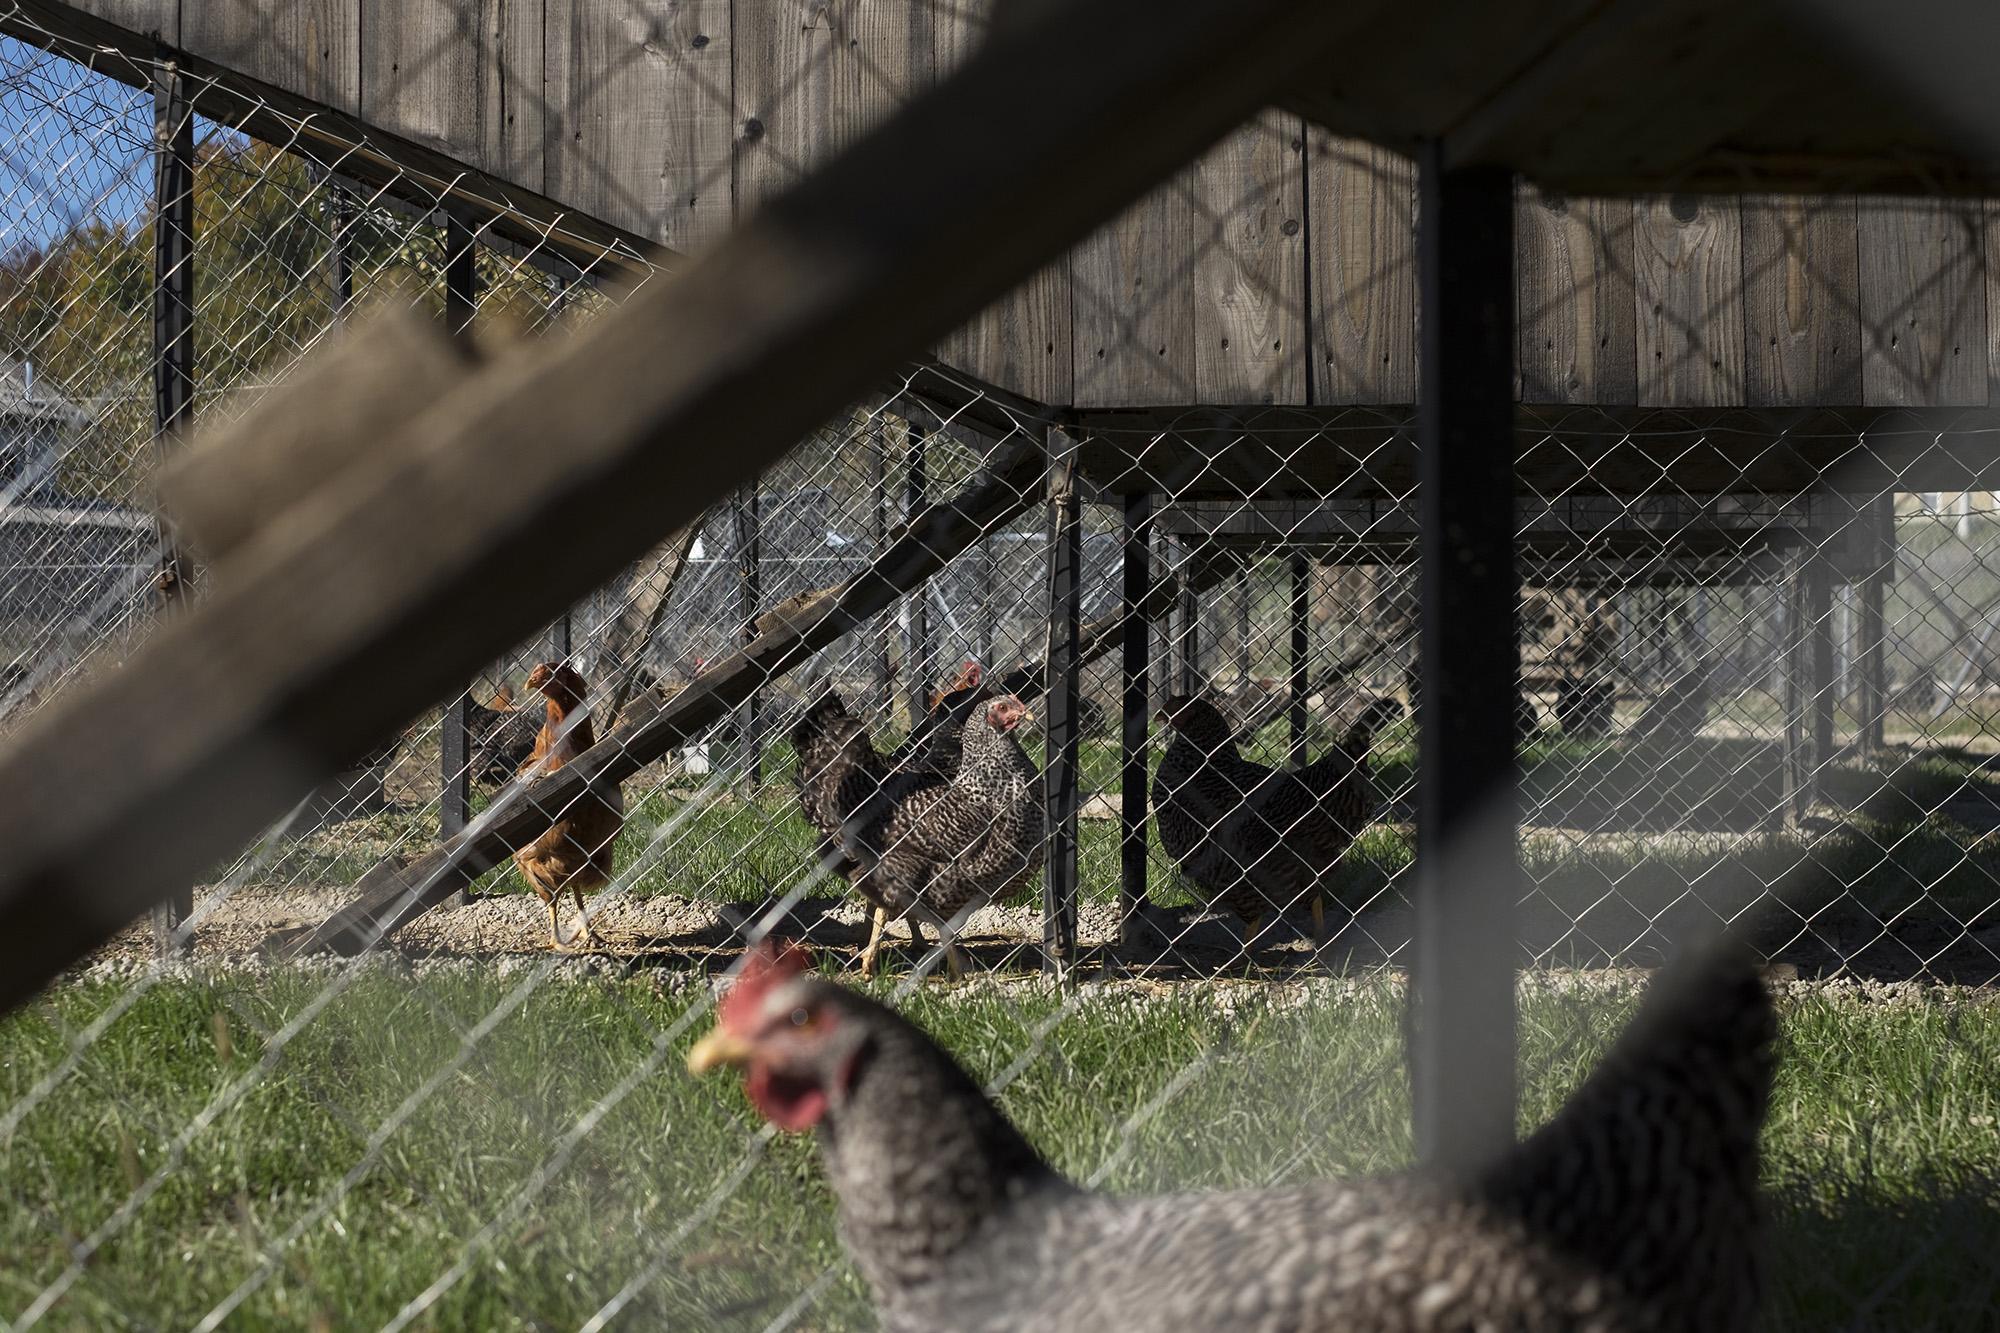 Chickenville, a chicken's ambition – Interview with SKROZ